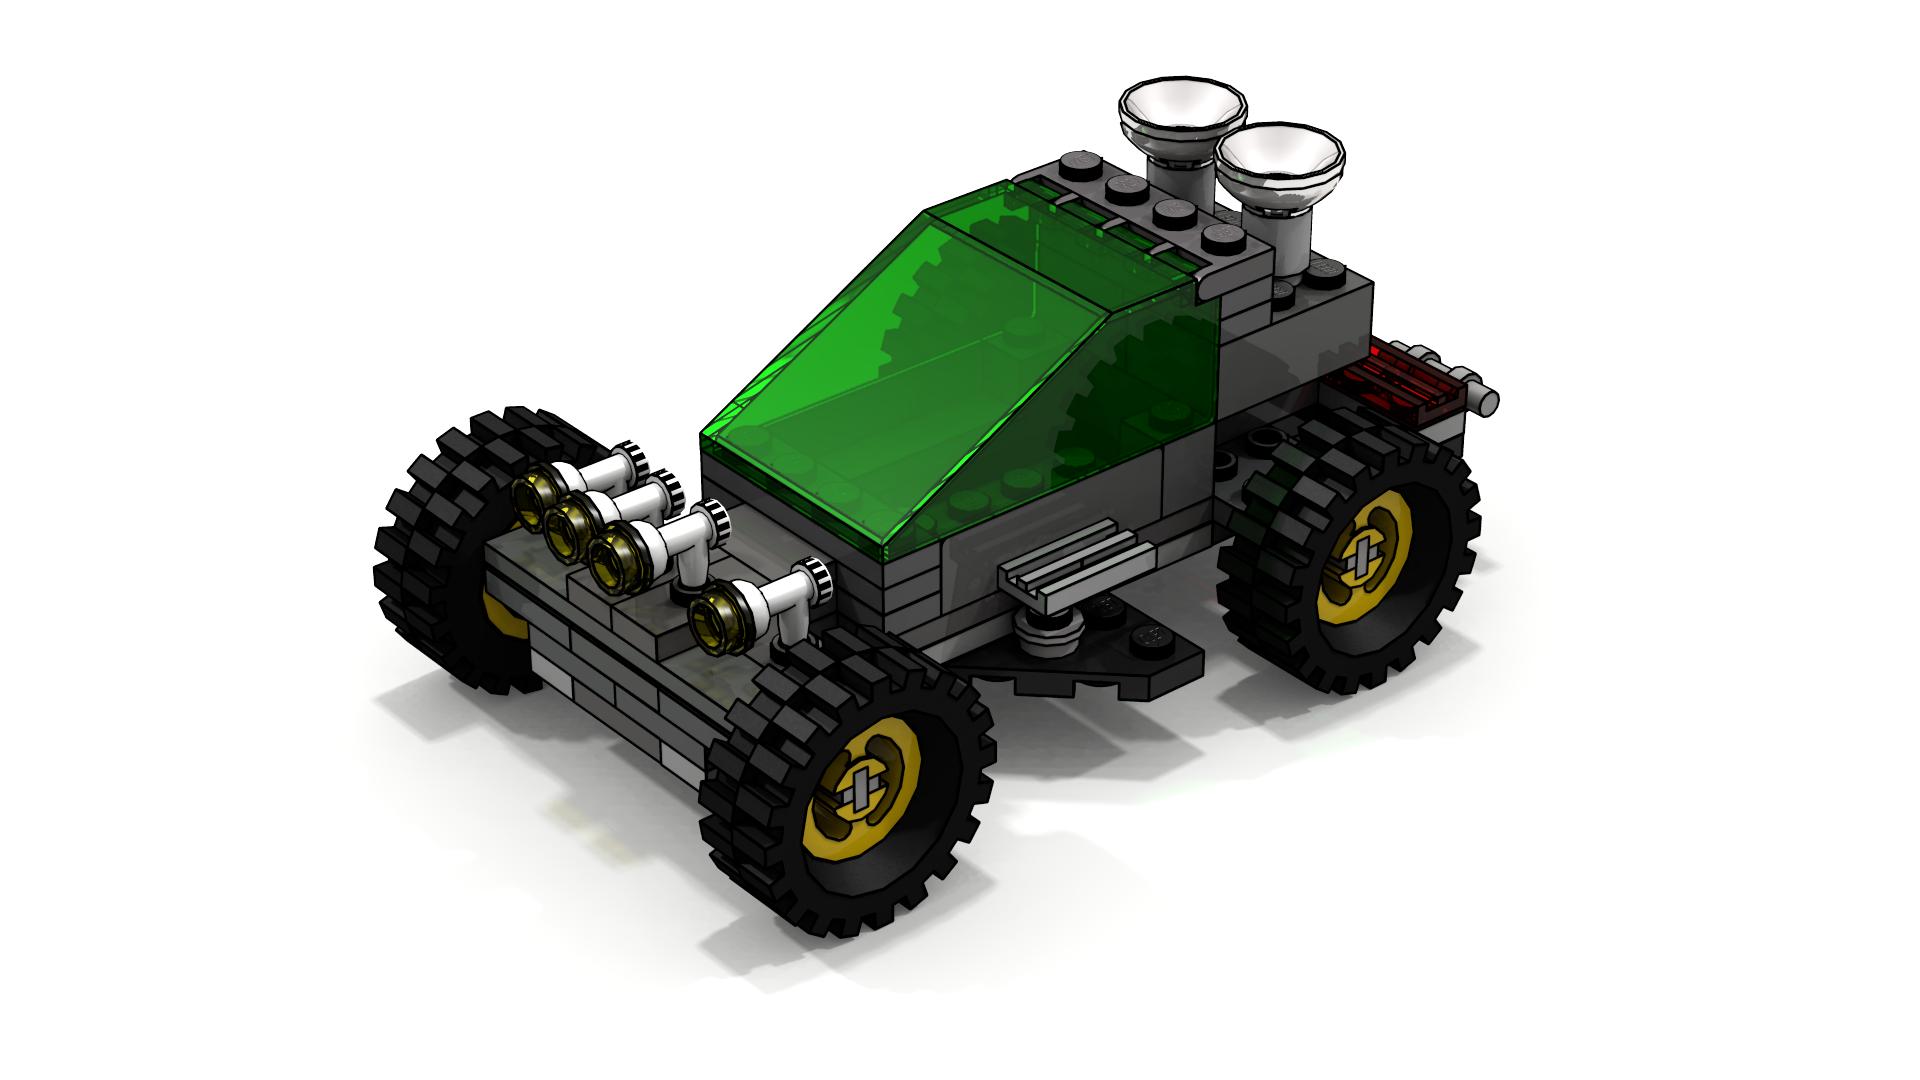 Lego Stunt Rally Mega Hurtz' Moon Buggy LDD Model